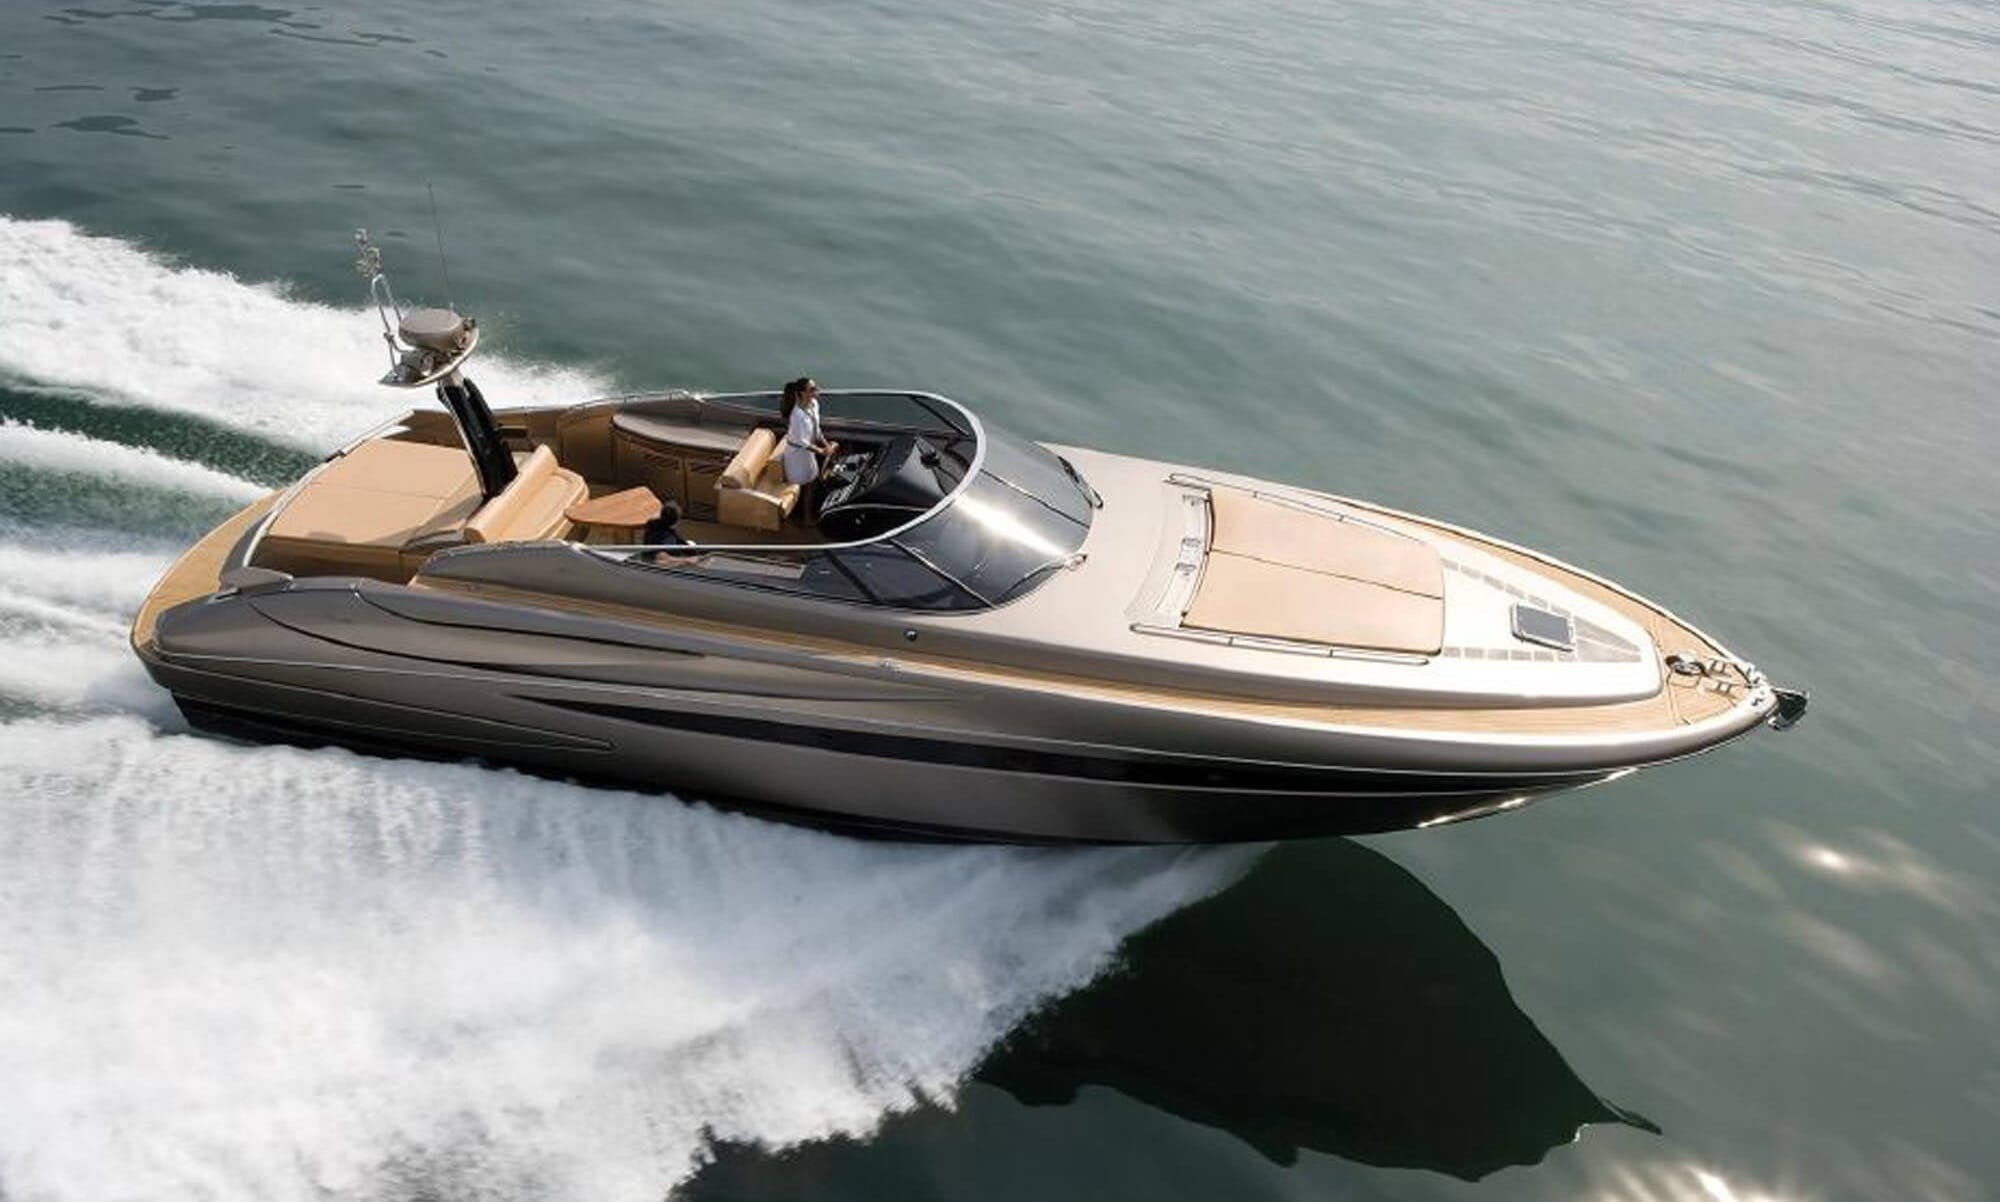 RIVA 52 Private Luxury Cruise in Santorini